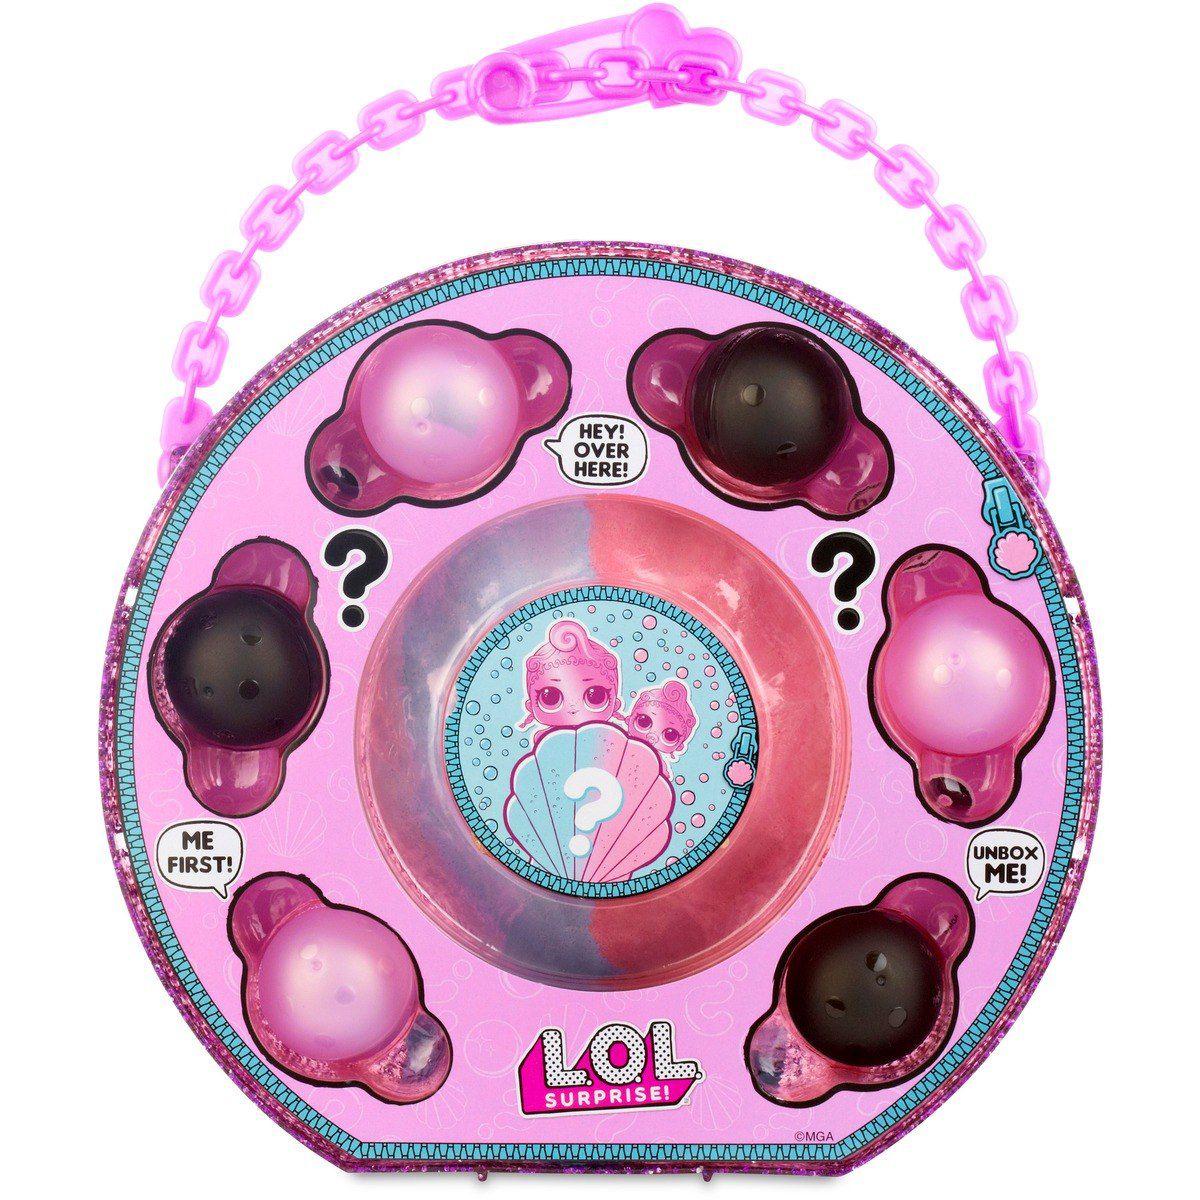 Boneca Lol Surprise - Lol Pearl Surprise Rosa - Candide  - Doce Diversão